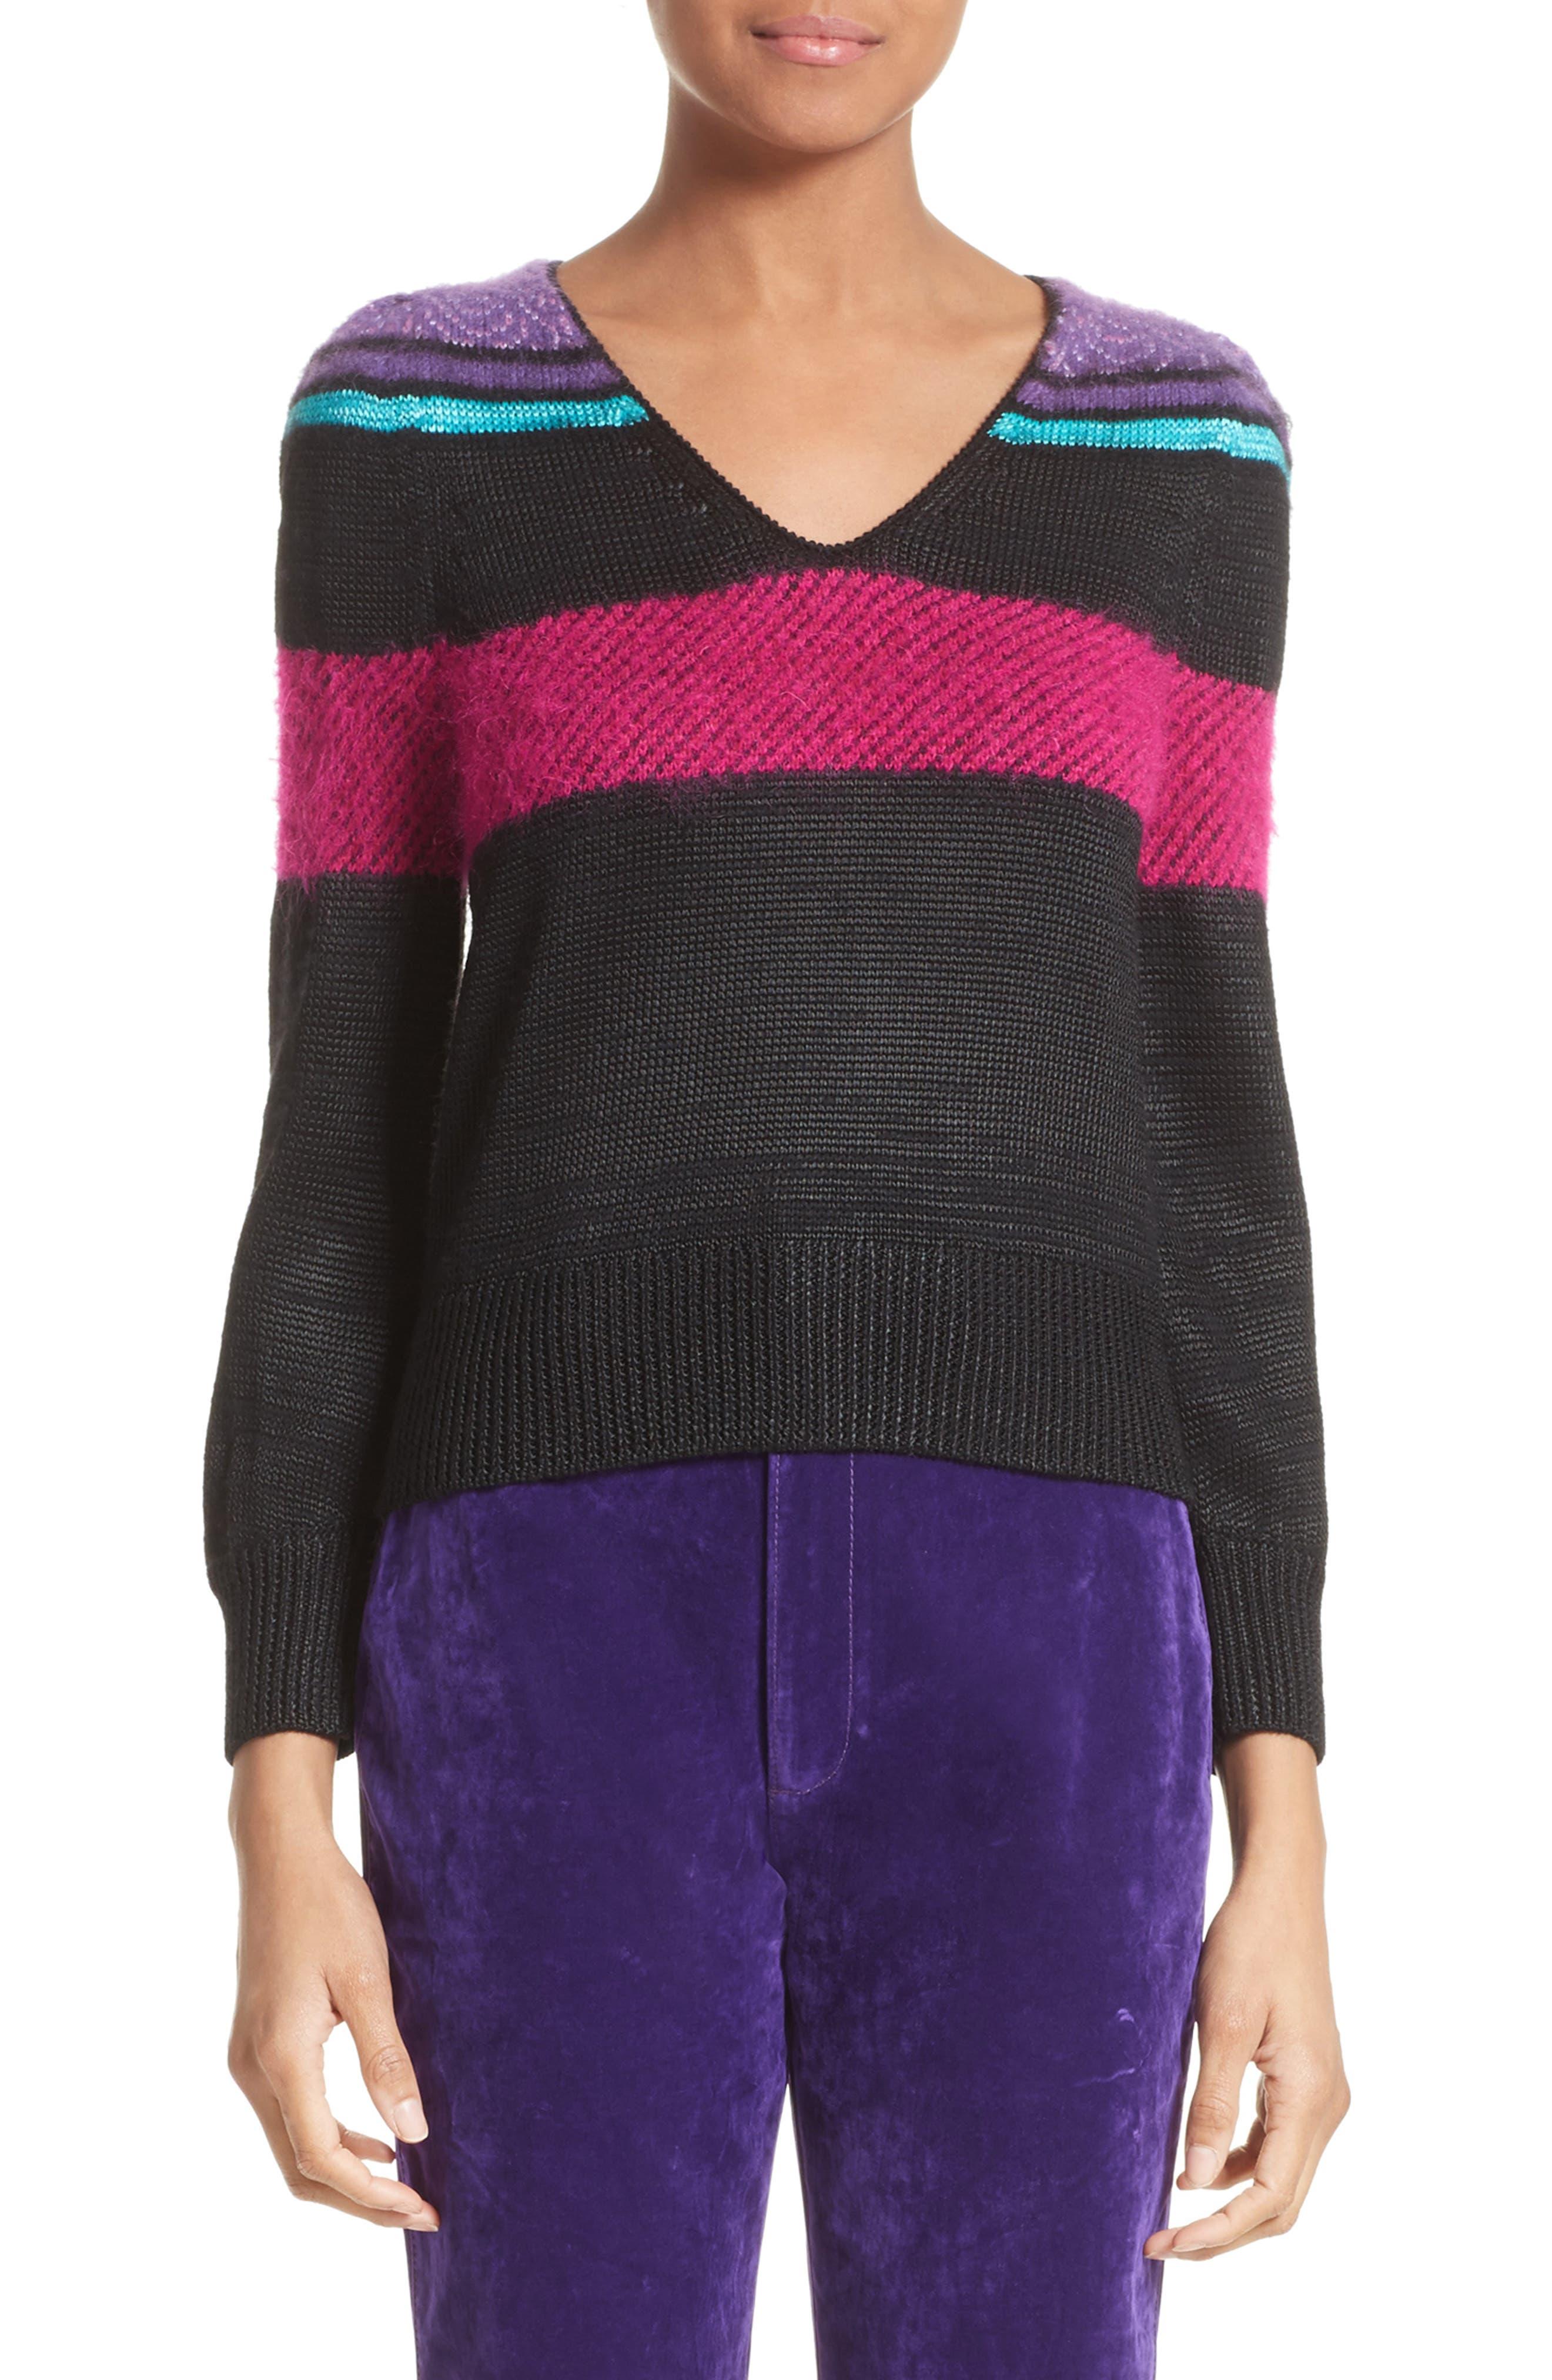 Main Image - MARC JACOBS '80s Stripe Knit Wool Sweater